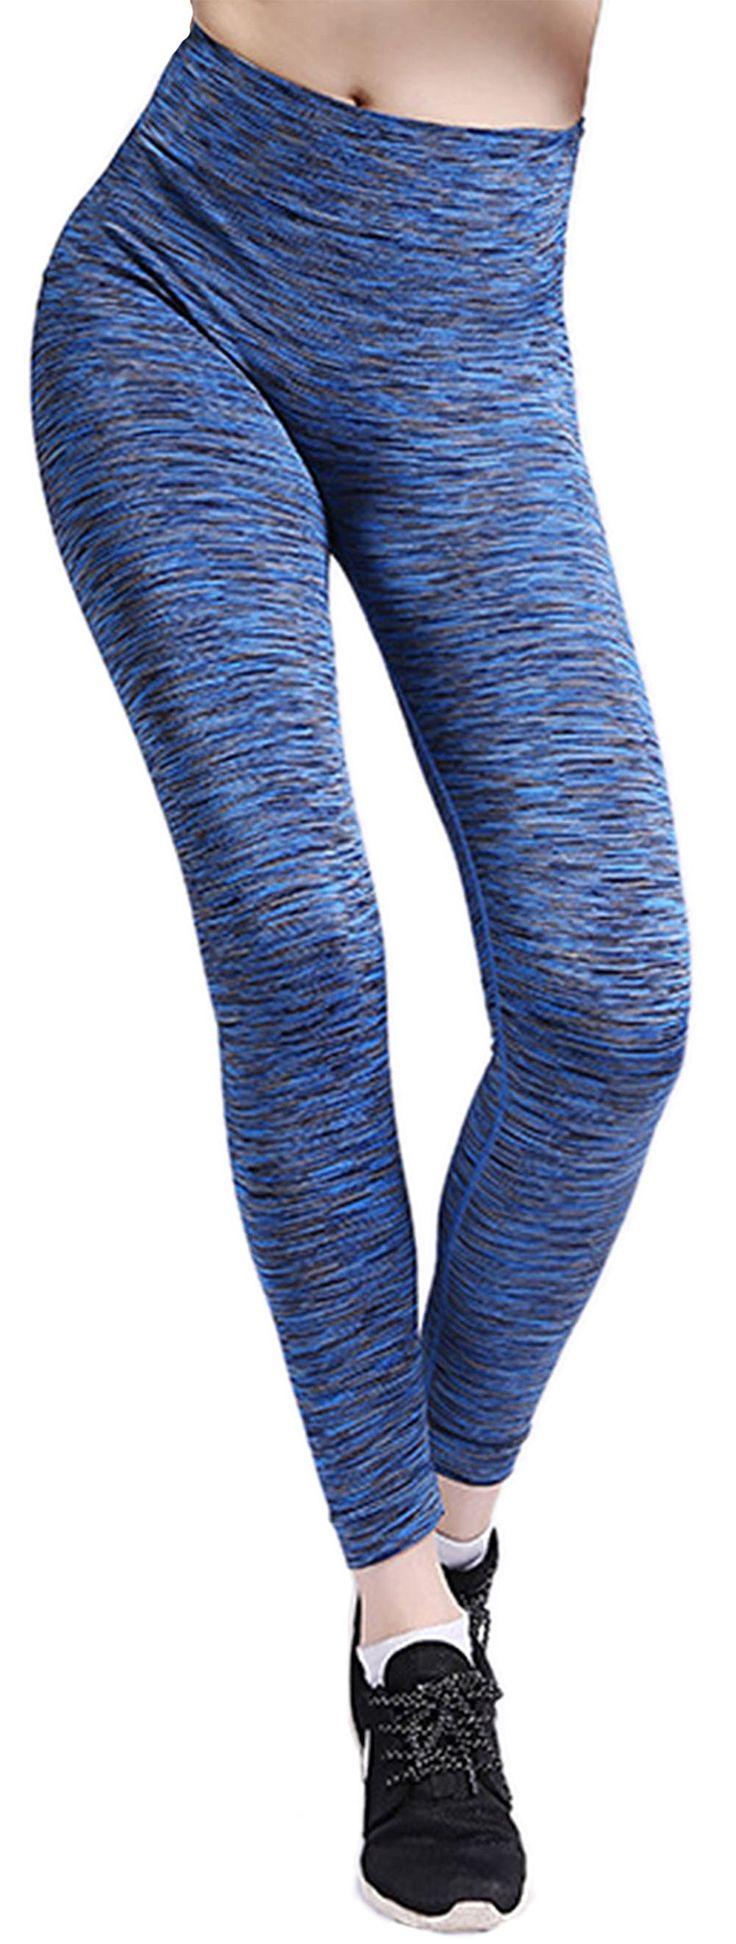 Amazon.com: Honour Fashion Women's Workout Tight Sports Pants Running Leggings: Clothing